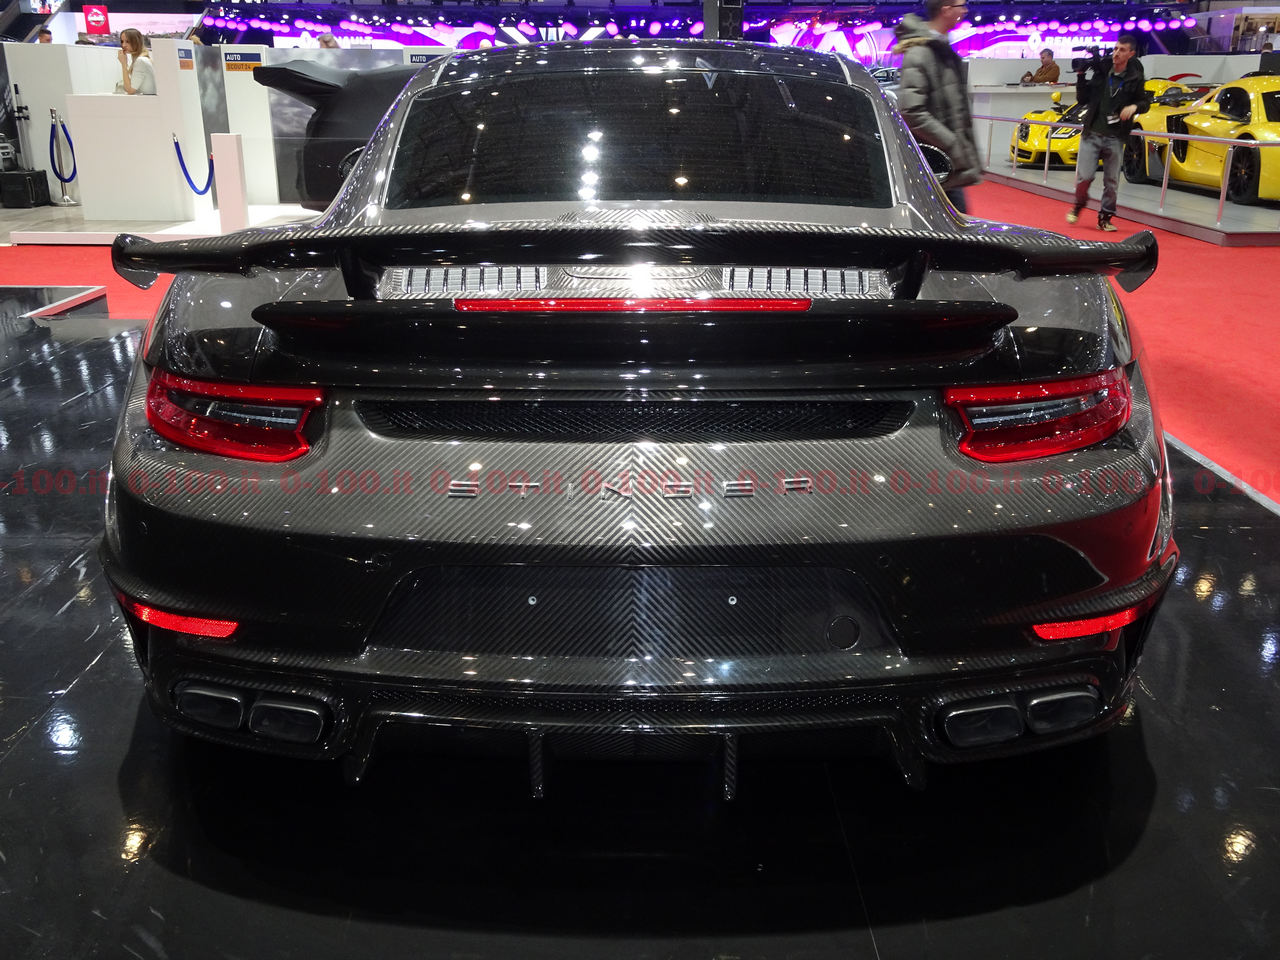 Geneve-ginevra-geneva-2017_tuning-top-car-porsche-991-2-gtr_0-100_5